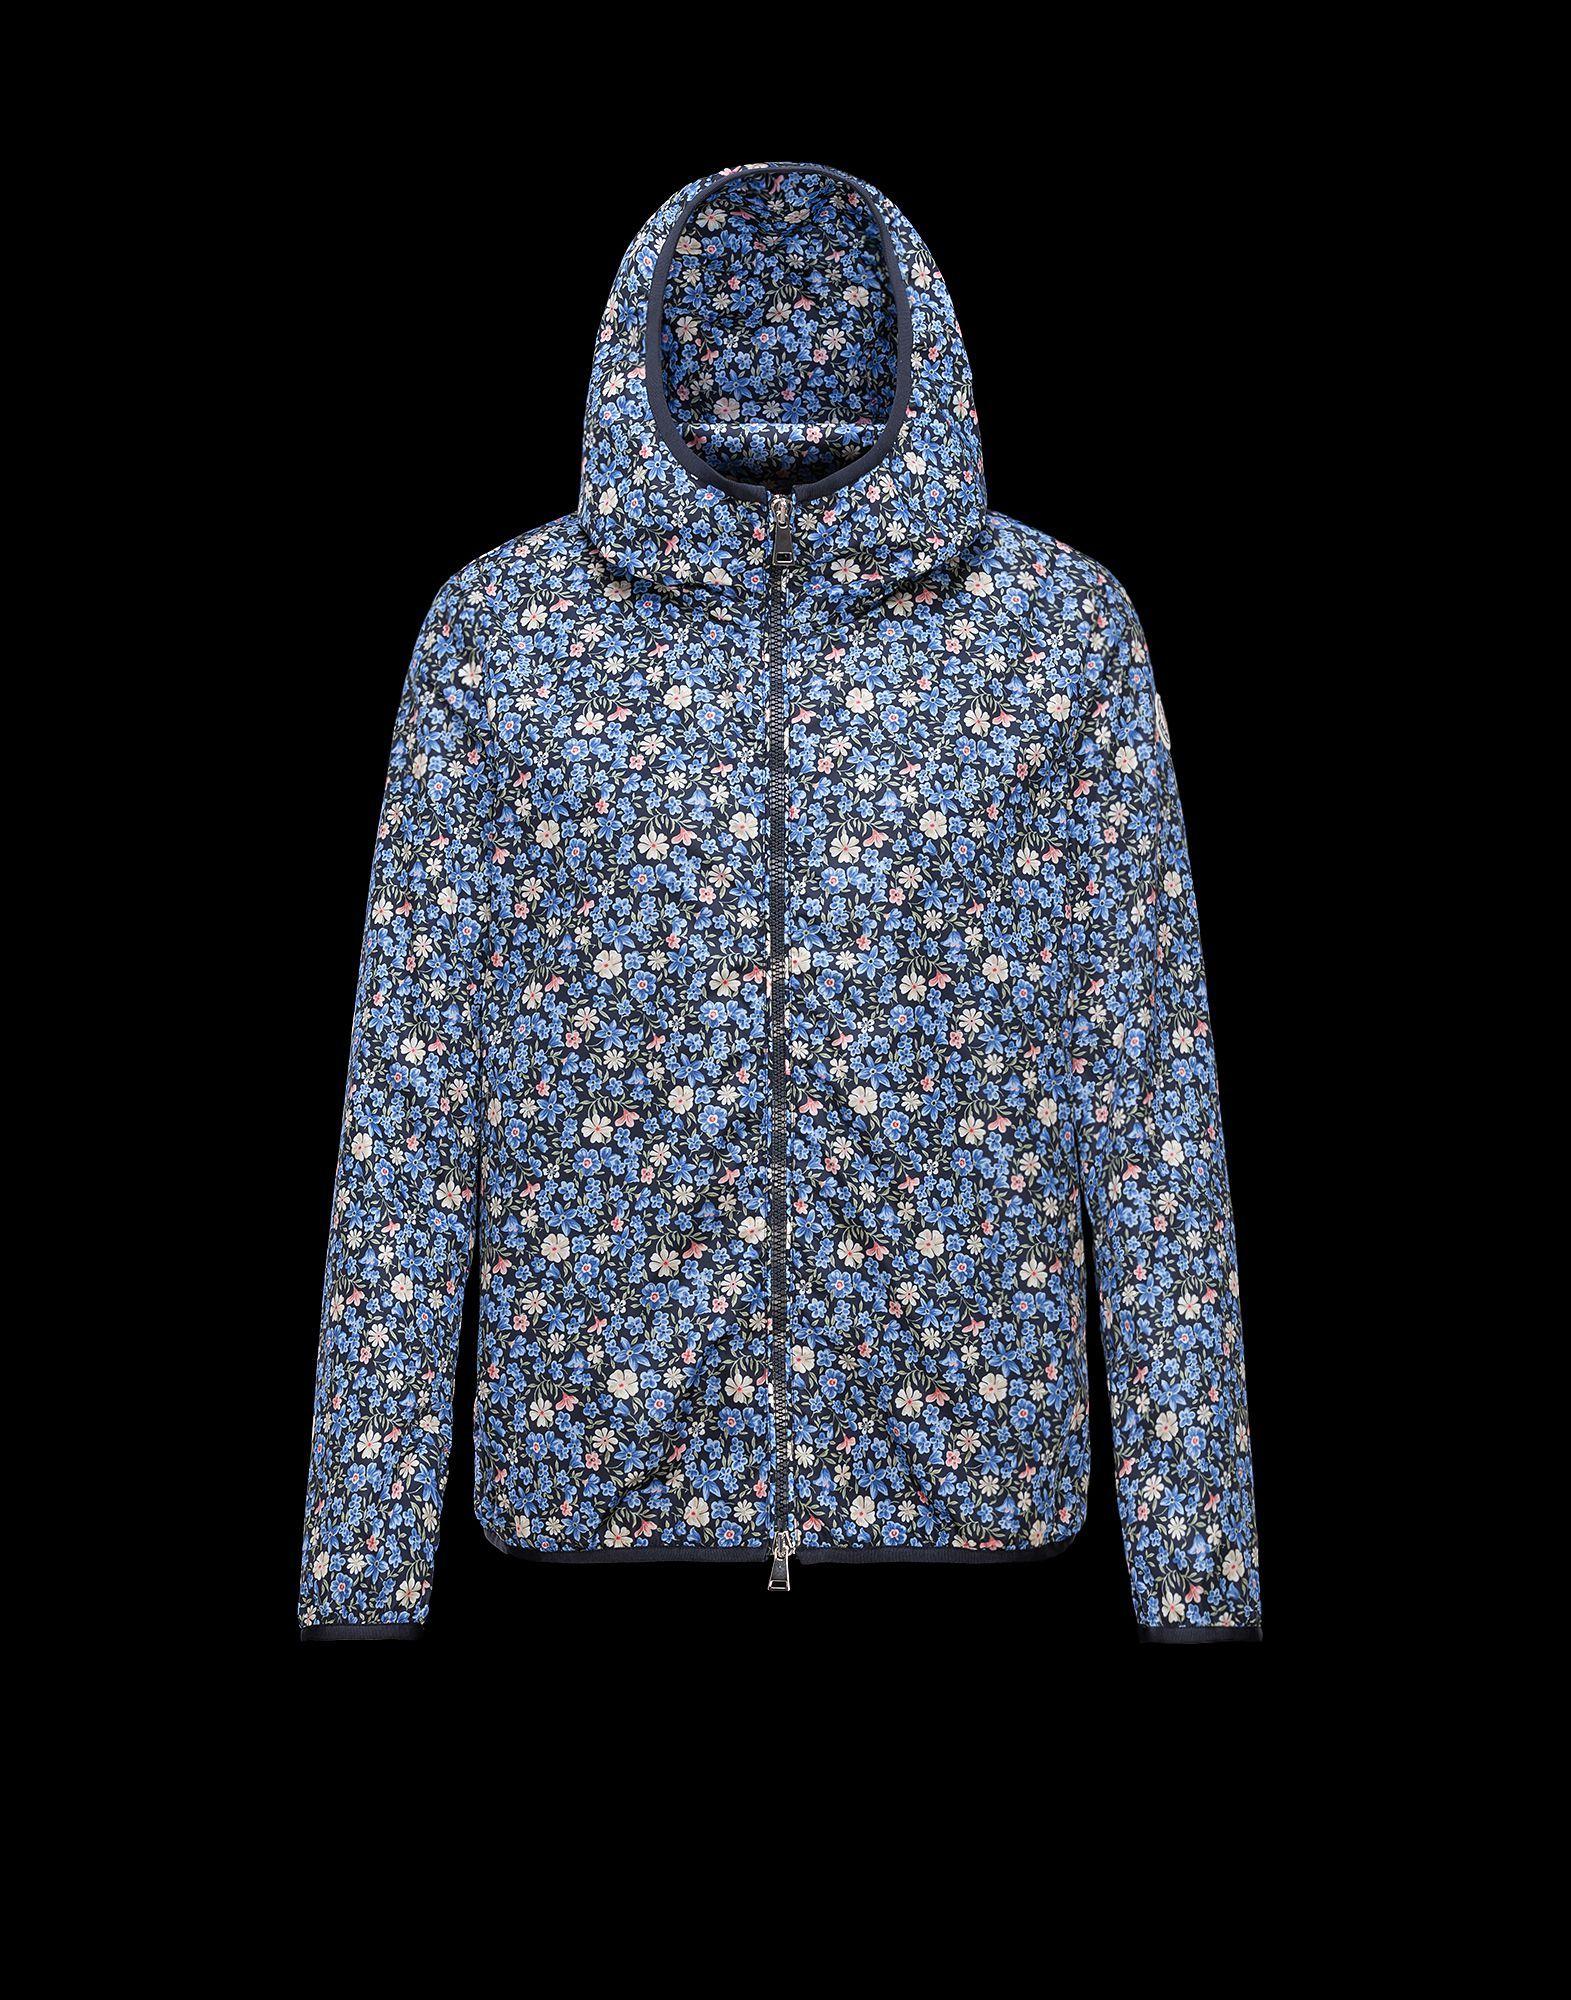 Moncler VIVE in Overcoats for women Official Online